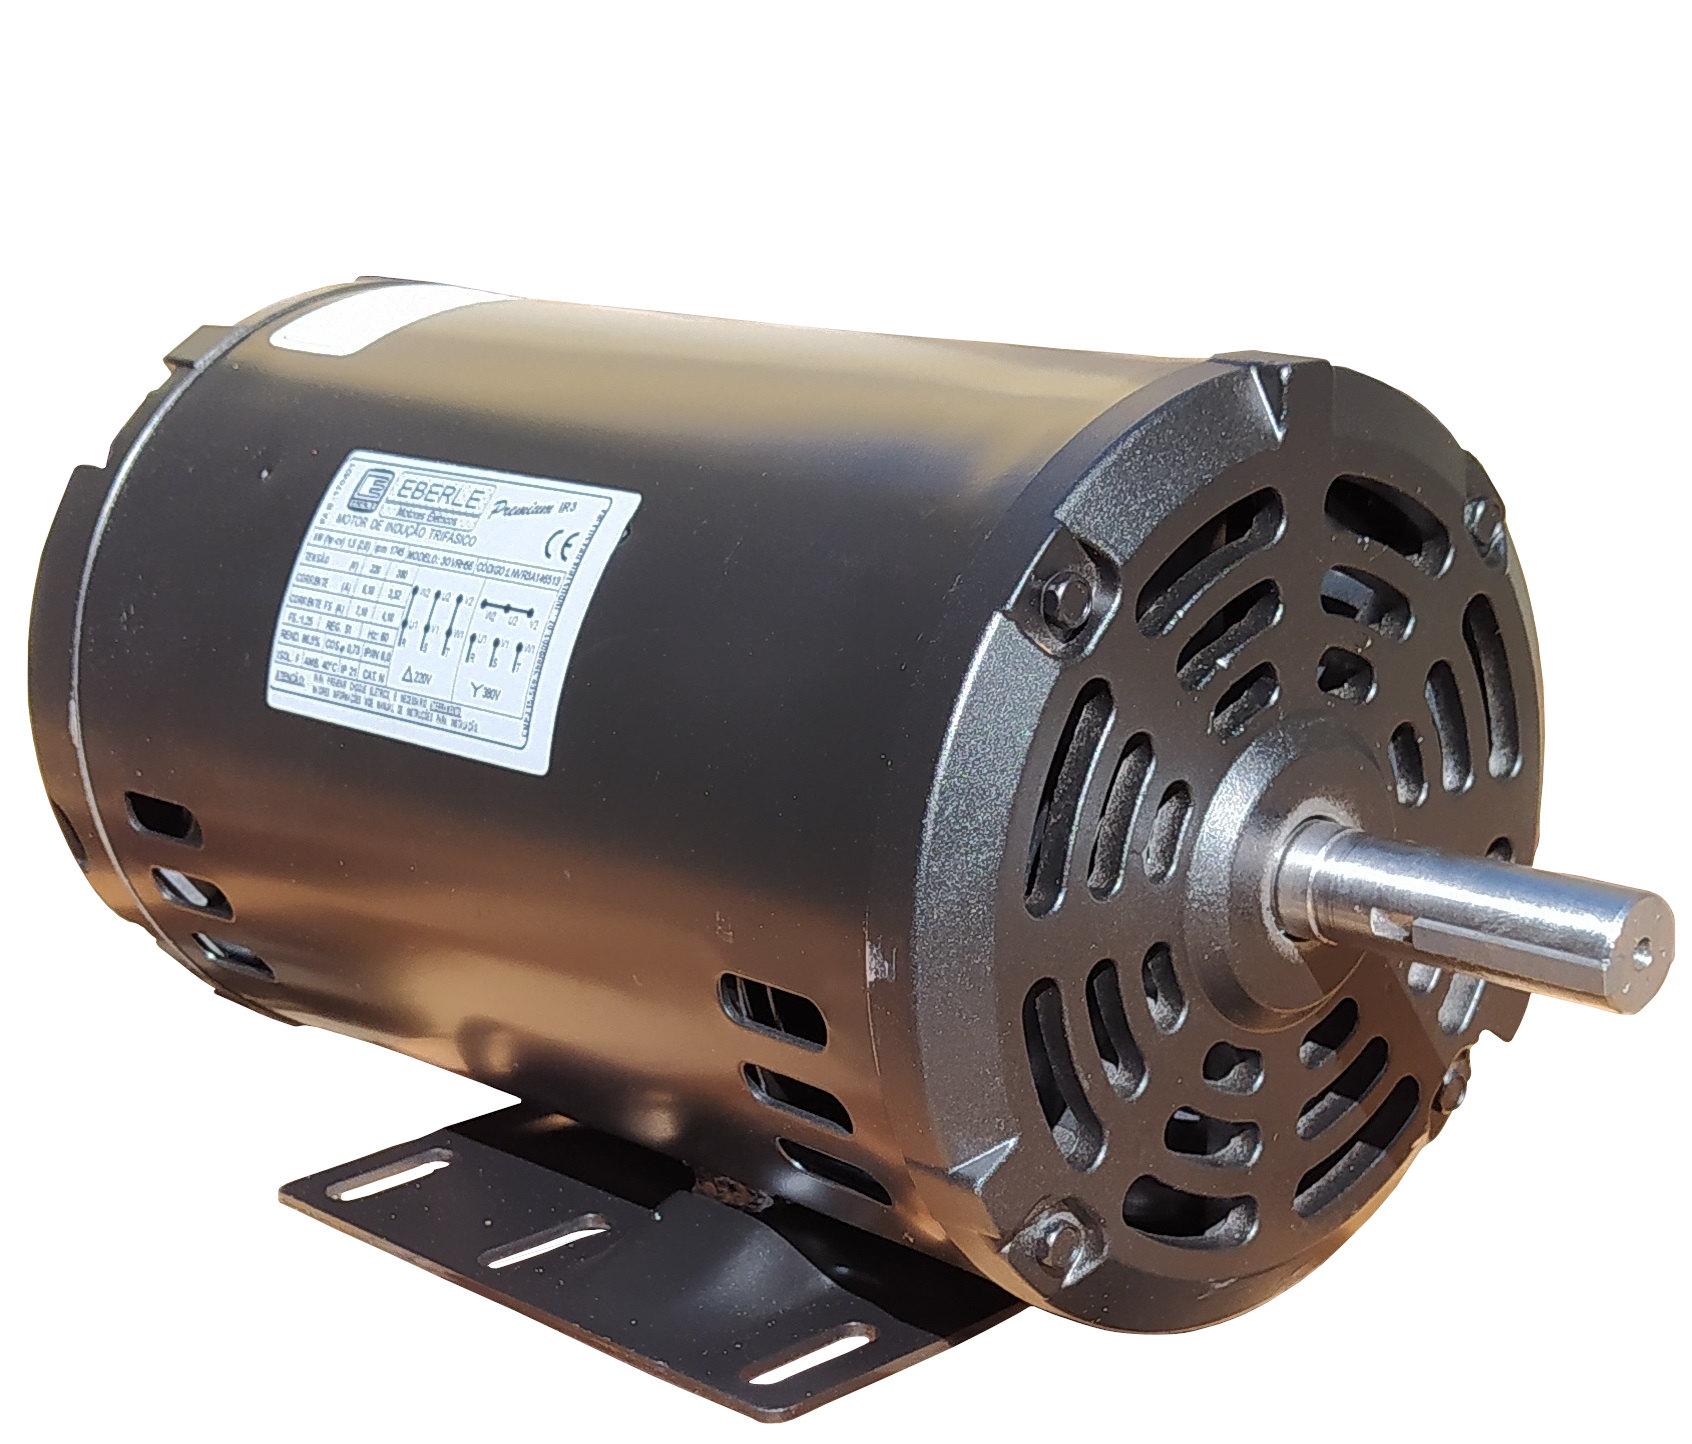 Motor Elétrico Trifásico 3cv 4 Polos Baixa Rotação 220/380v Aberto IP21 Eberle Mercosul IR3